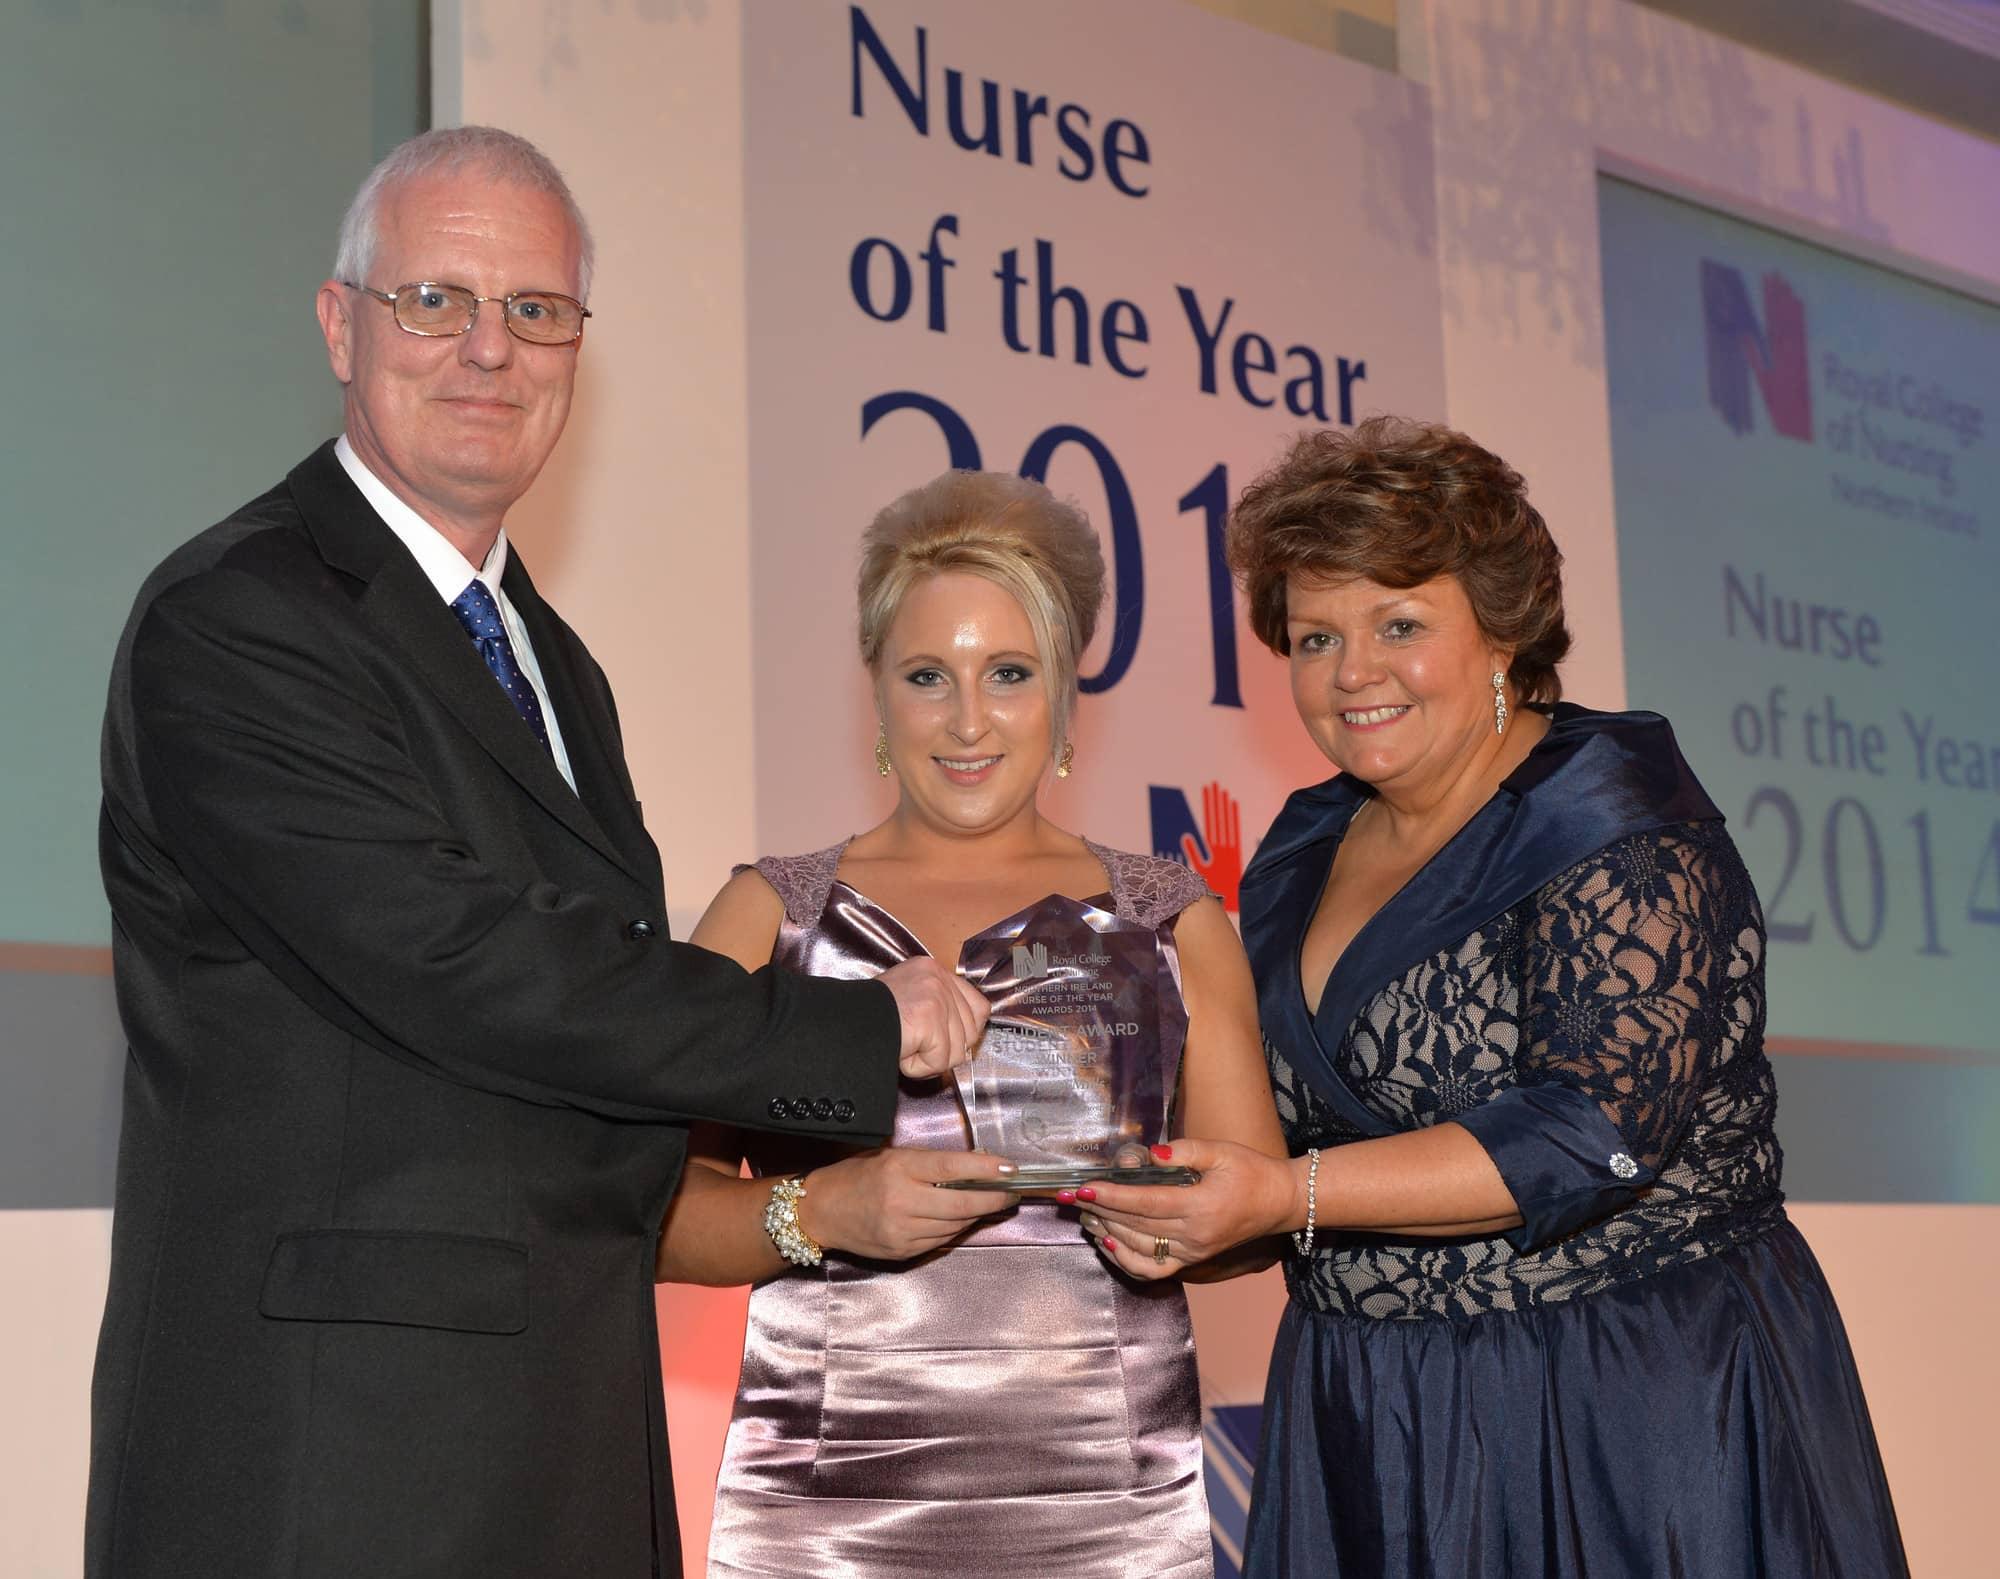 Sam Porter and Janice Smyth (R) with Student Nurse of the Year winner Jenny Mills